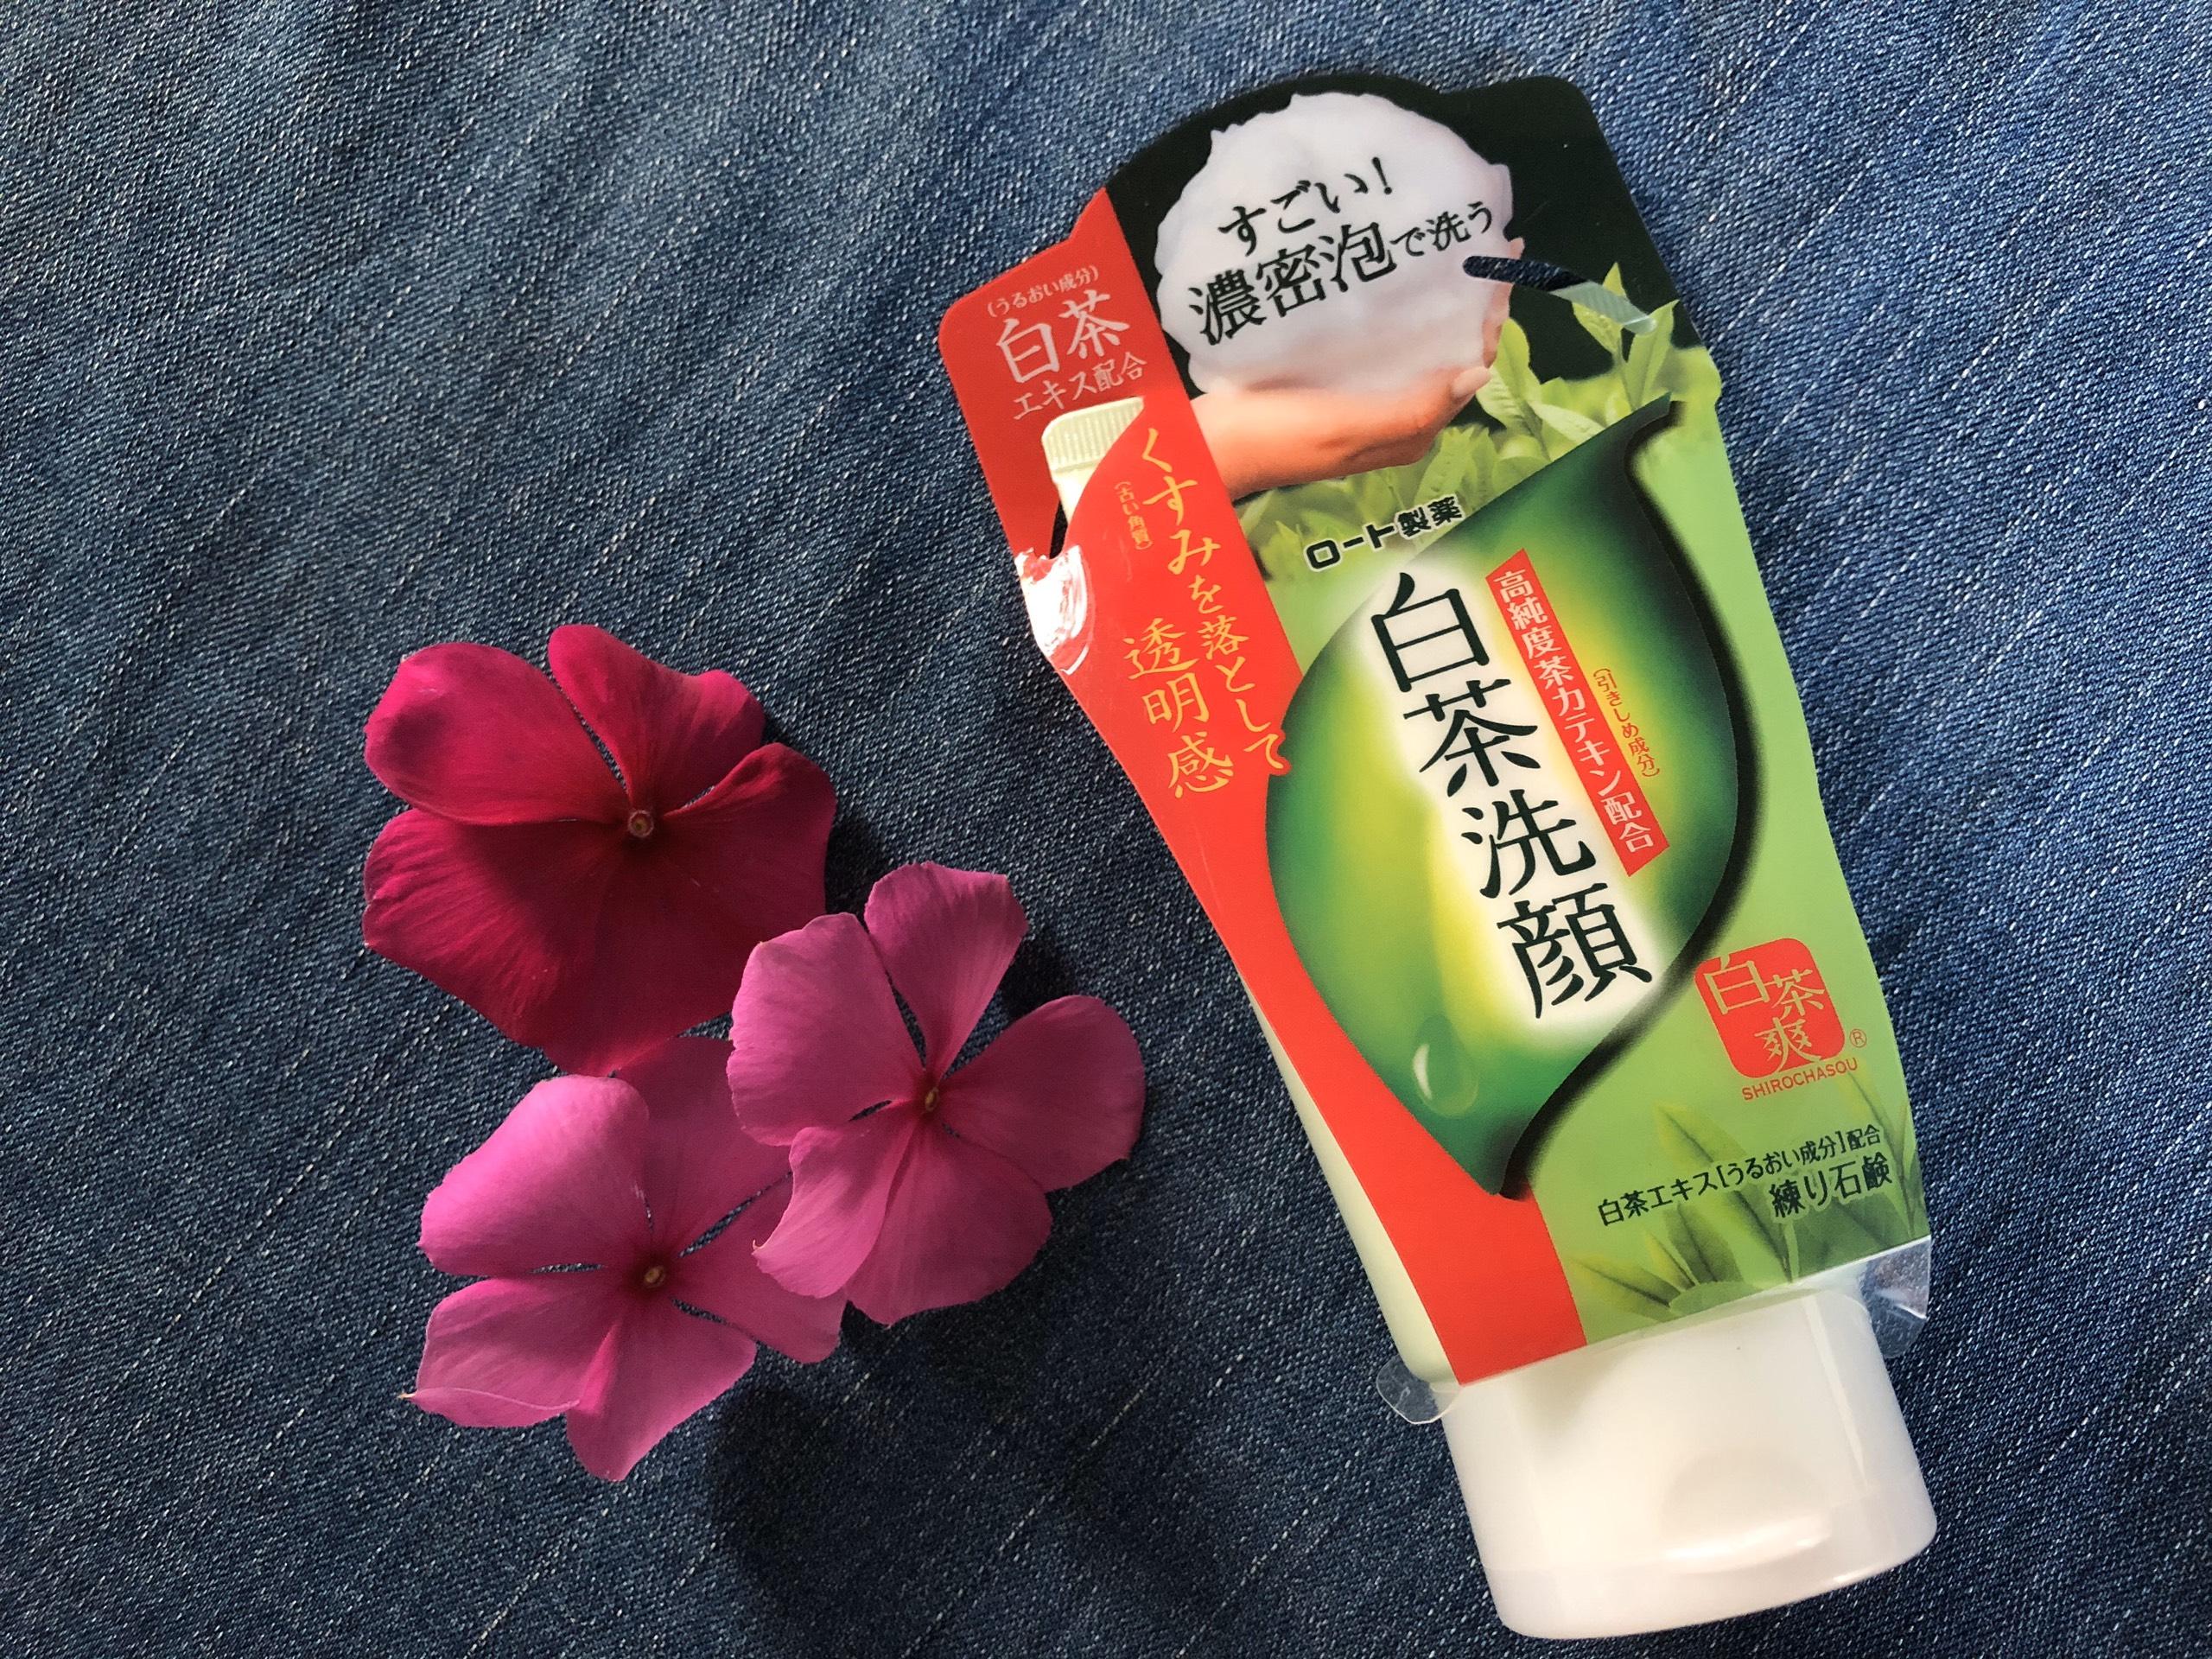 Sữa rửa mặt trà xanh Rohto Shirochasou green tea cao cấp